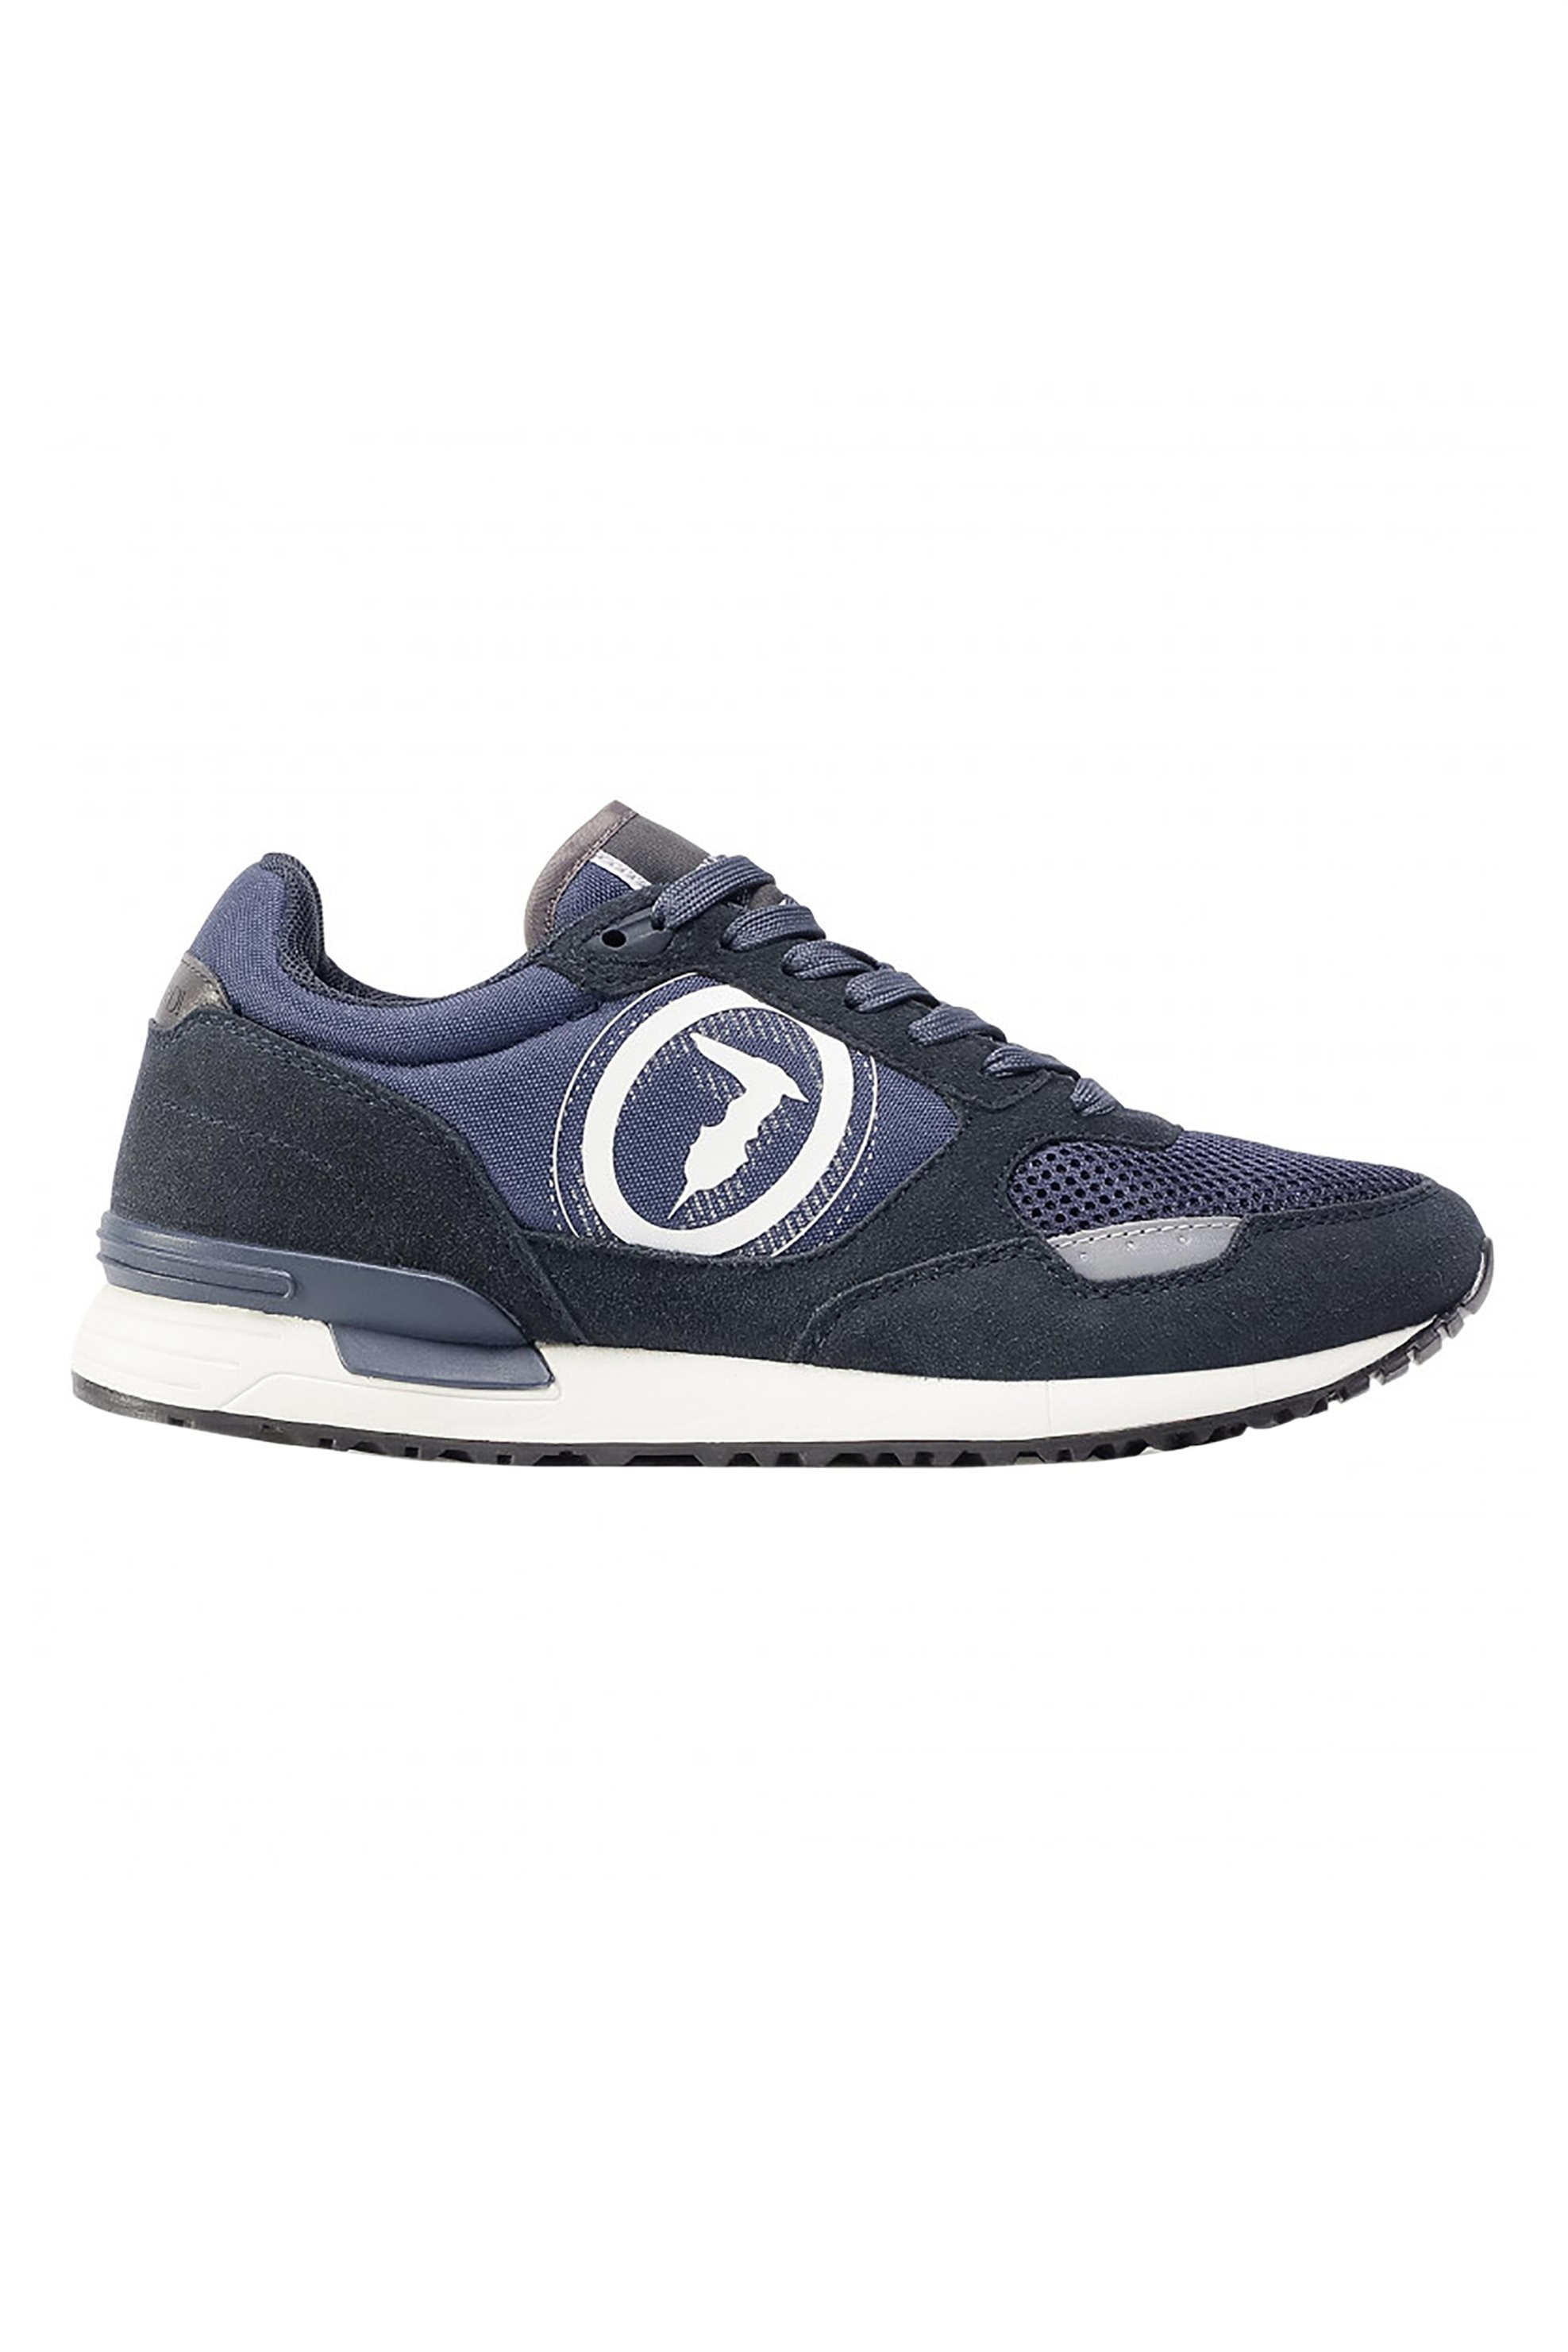 Trussardi Jeans ανδρικά sneakers με suede λεπτομέρειες – 77A00281-9Y099998 – Μπλε Σκούρο